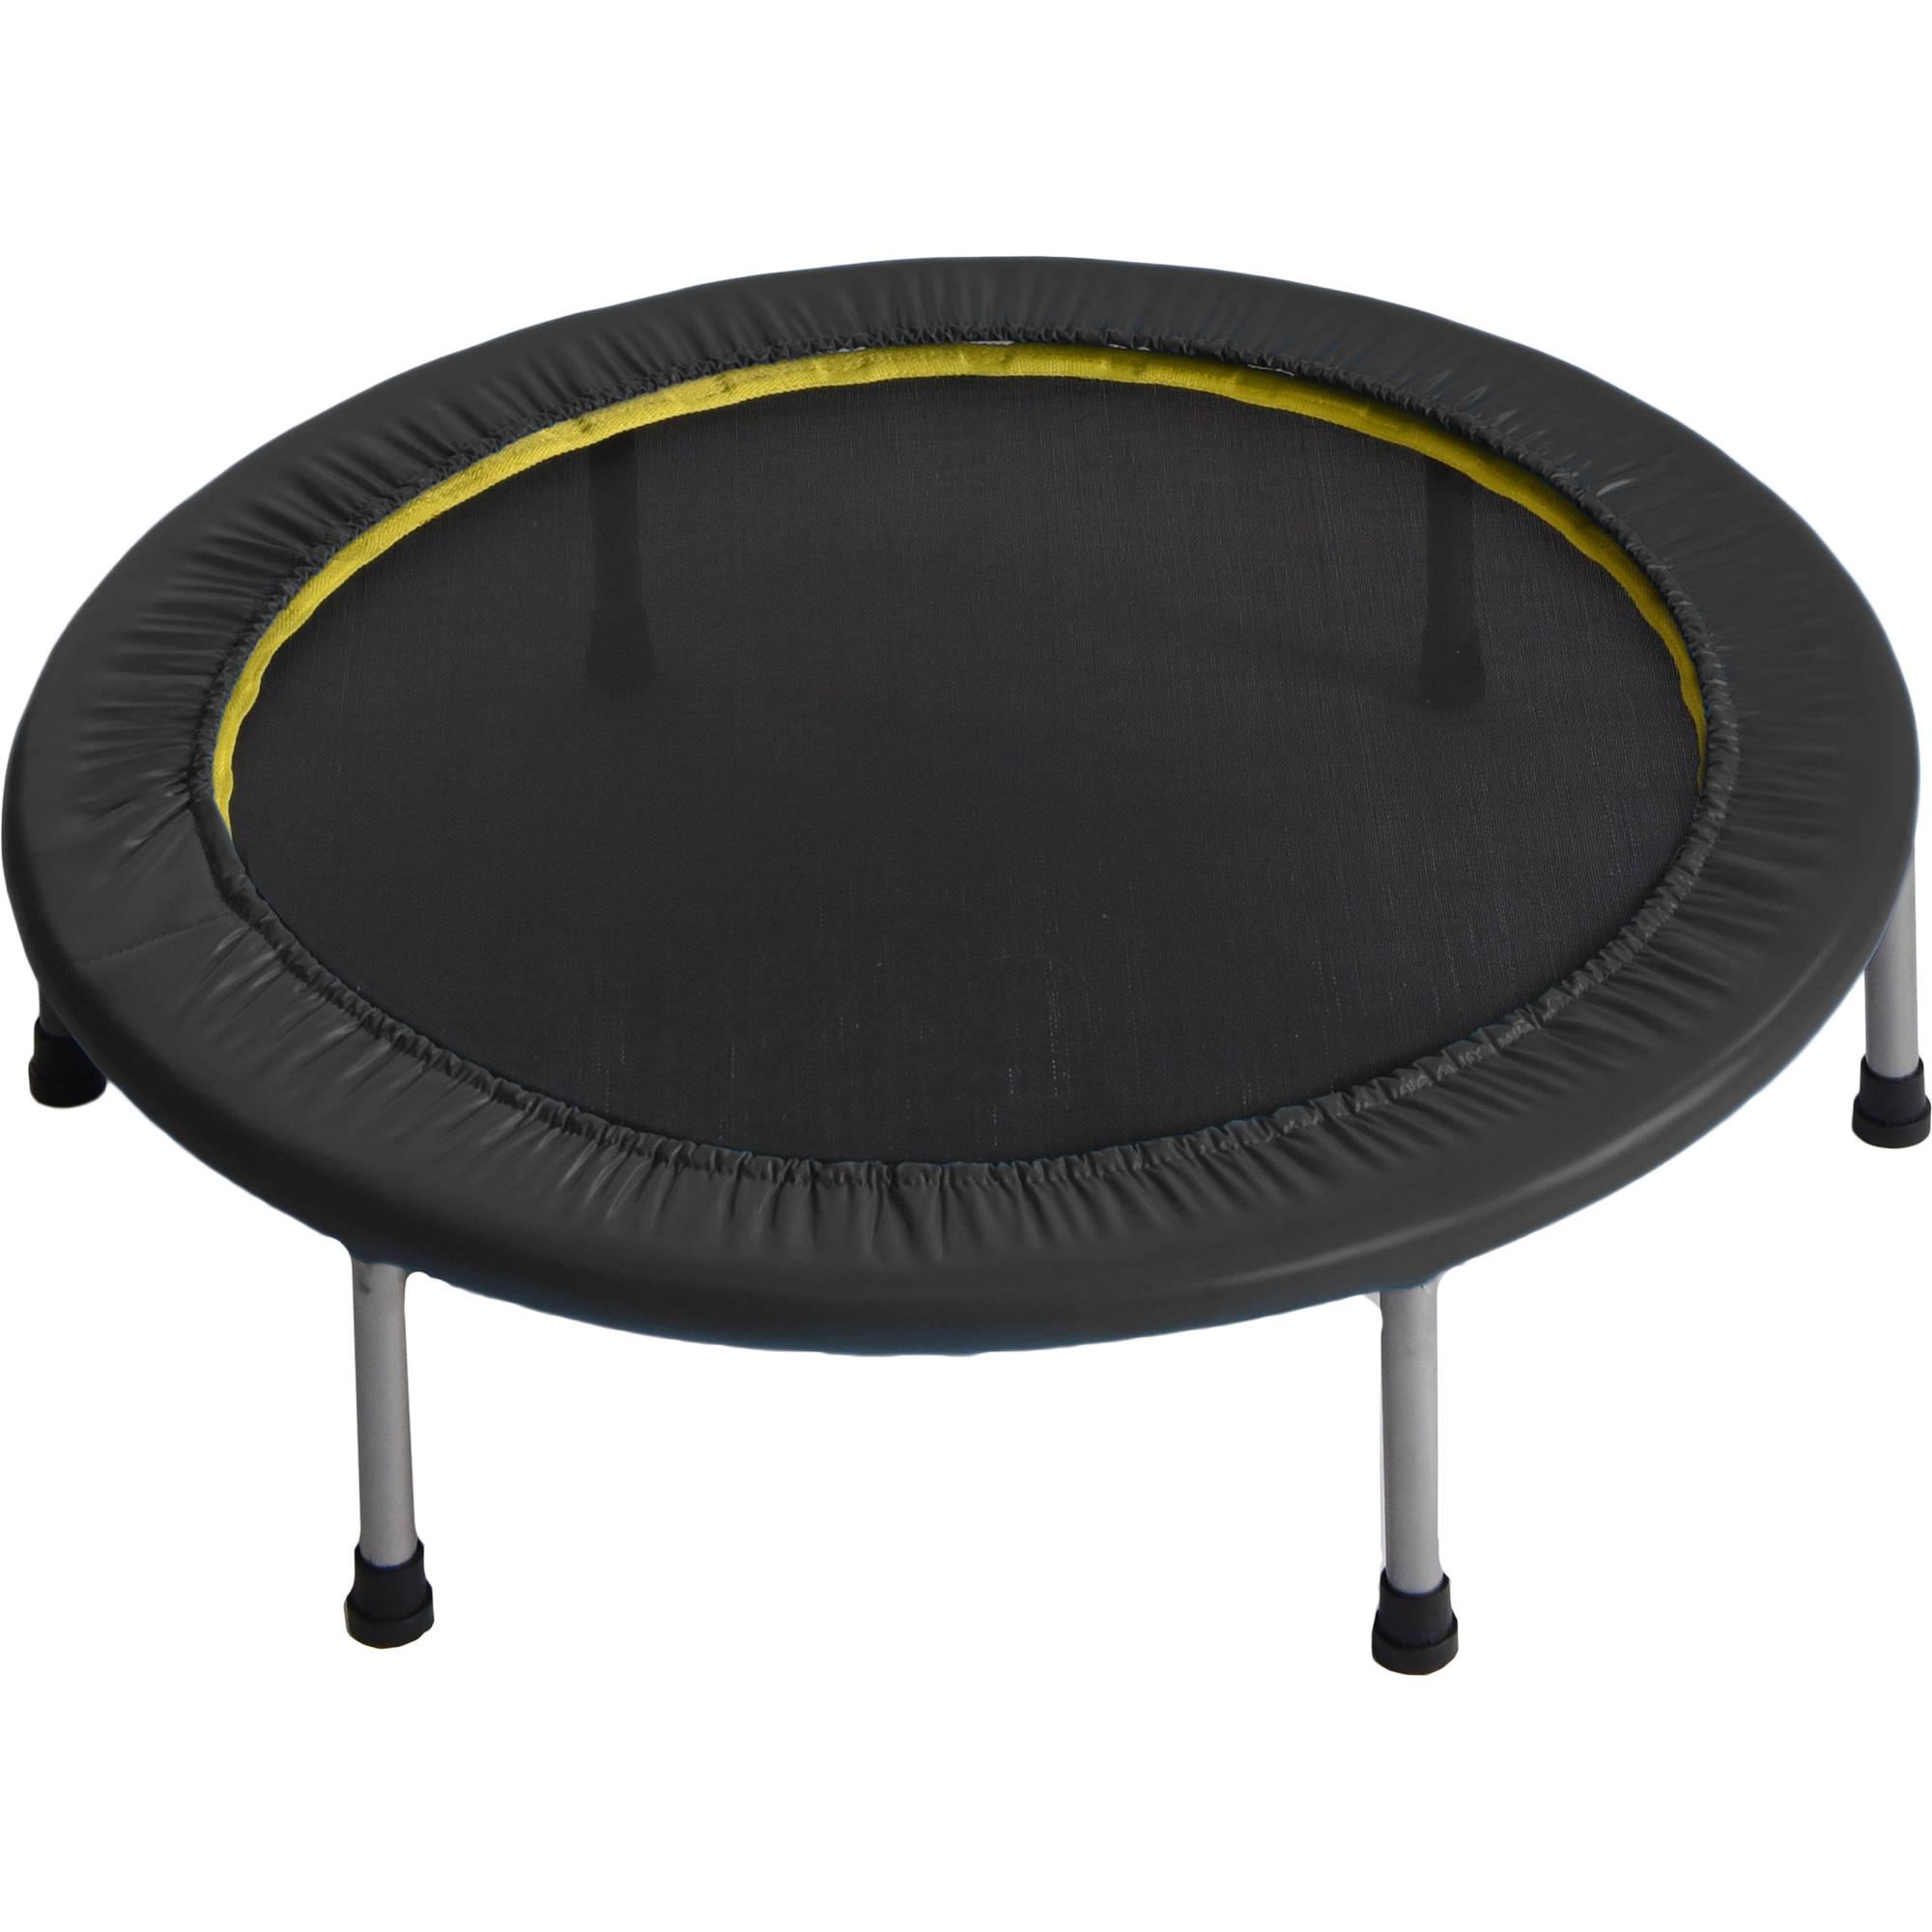 Gold's Gym 36-Inch Cardio Trampoline, Black